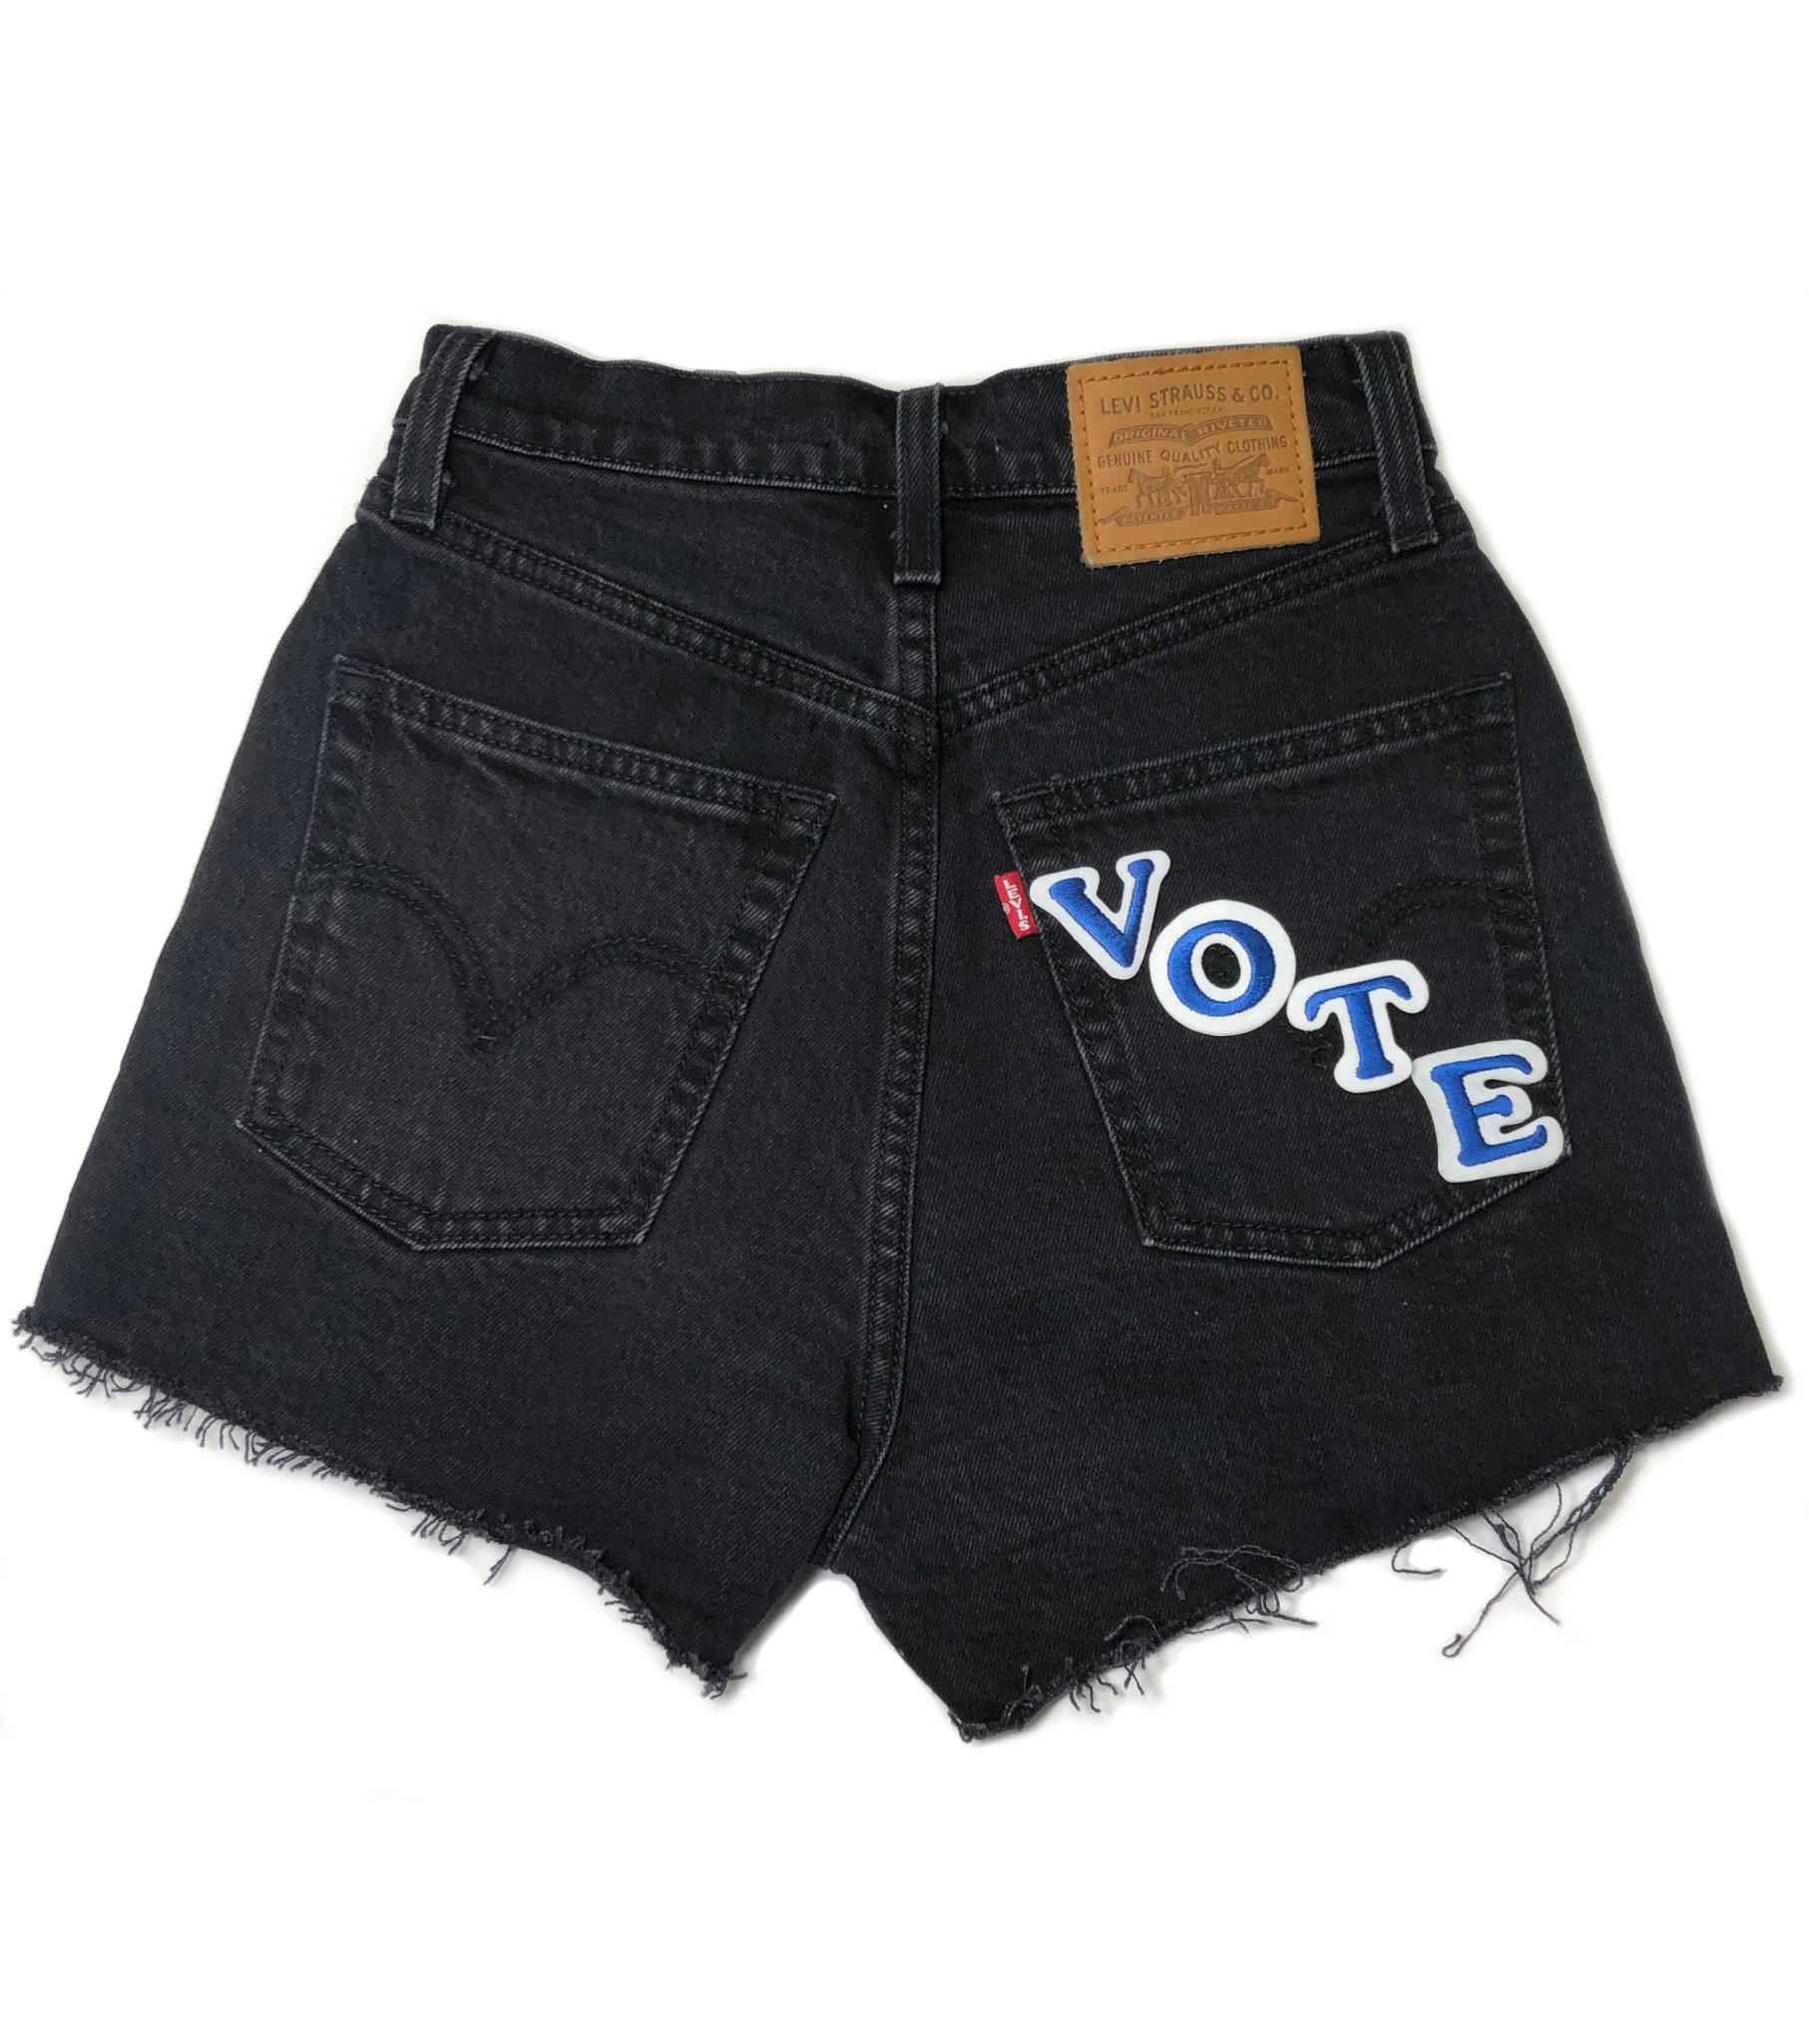 LEVI'S  VOTE RIBCAGE SHORTS 77879-0052 BLACK BAYOU-1